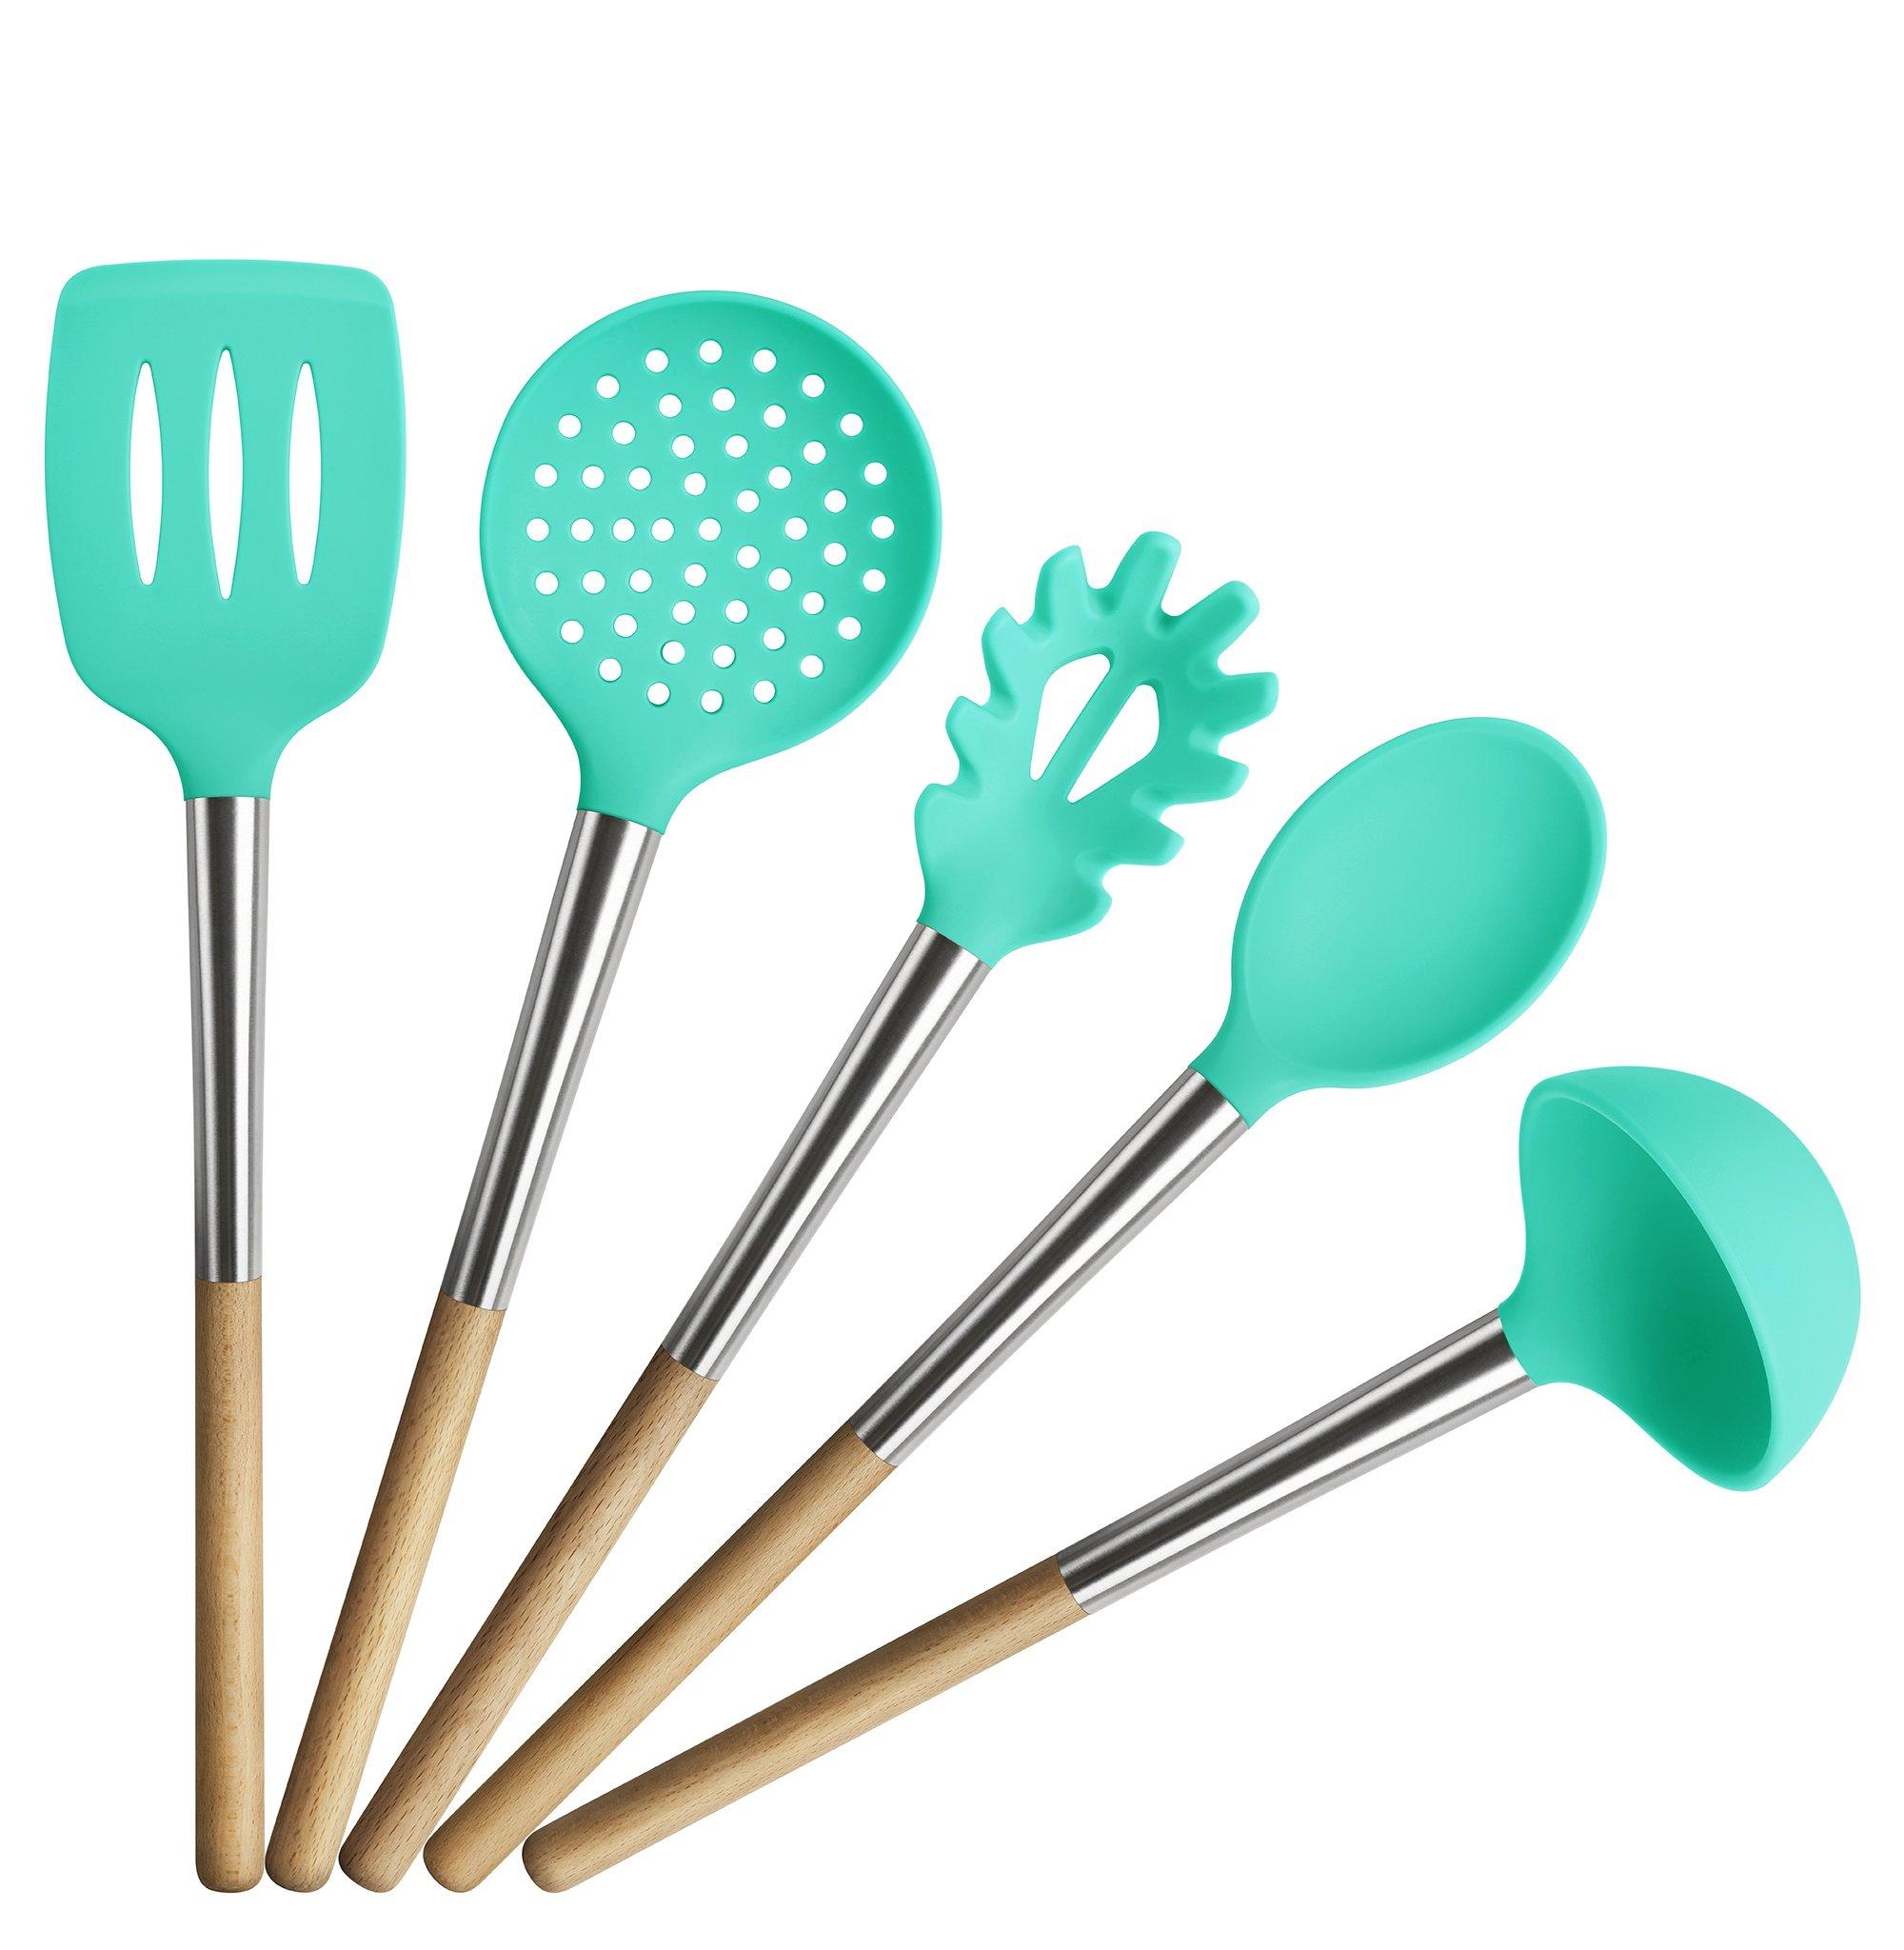 TOPHOME Kitchen Utensils Cooking Utensils Nonstick Utensil Set Beech ...